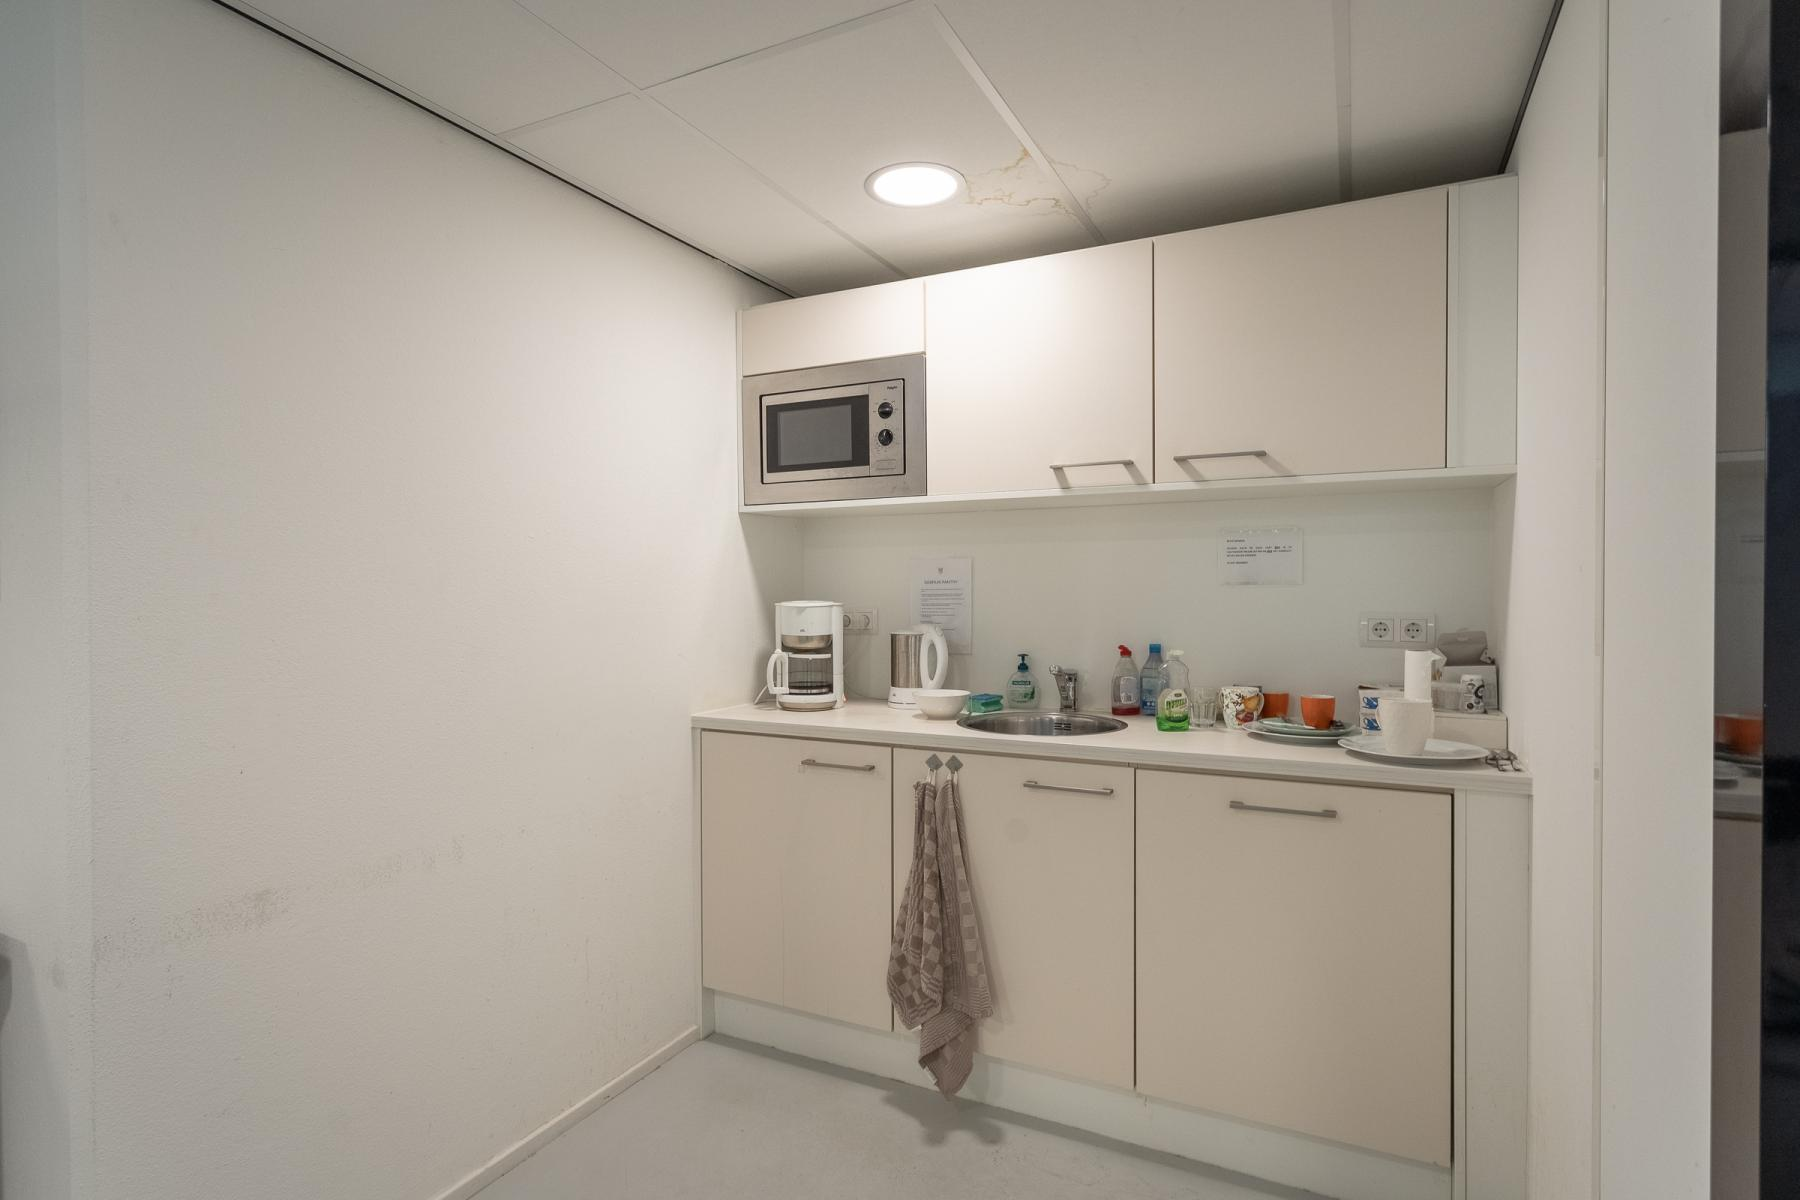 keukenblok pantry Arnhem kantoorruimte meerdere verdiepingen mooi uitzicht